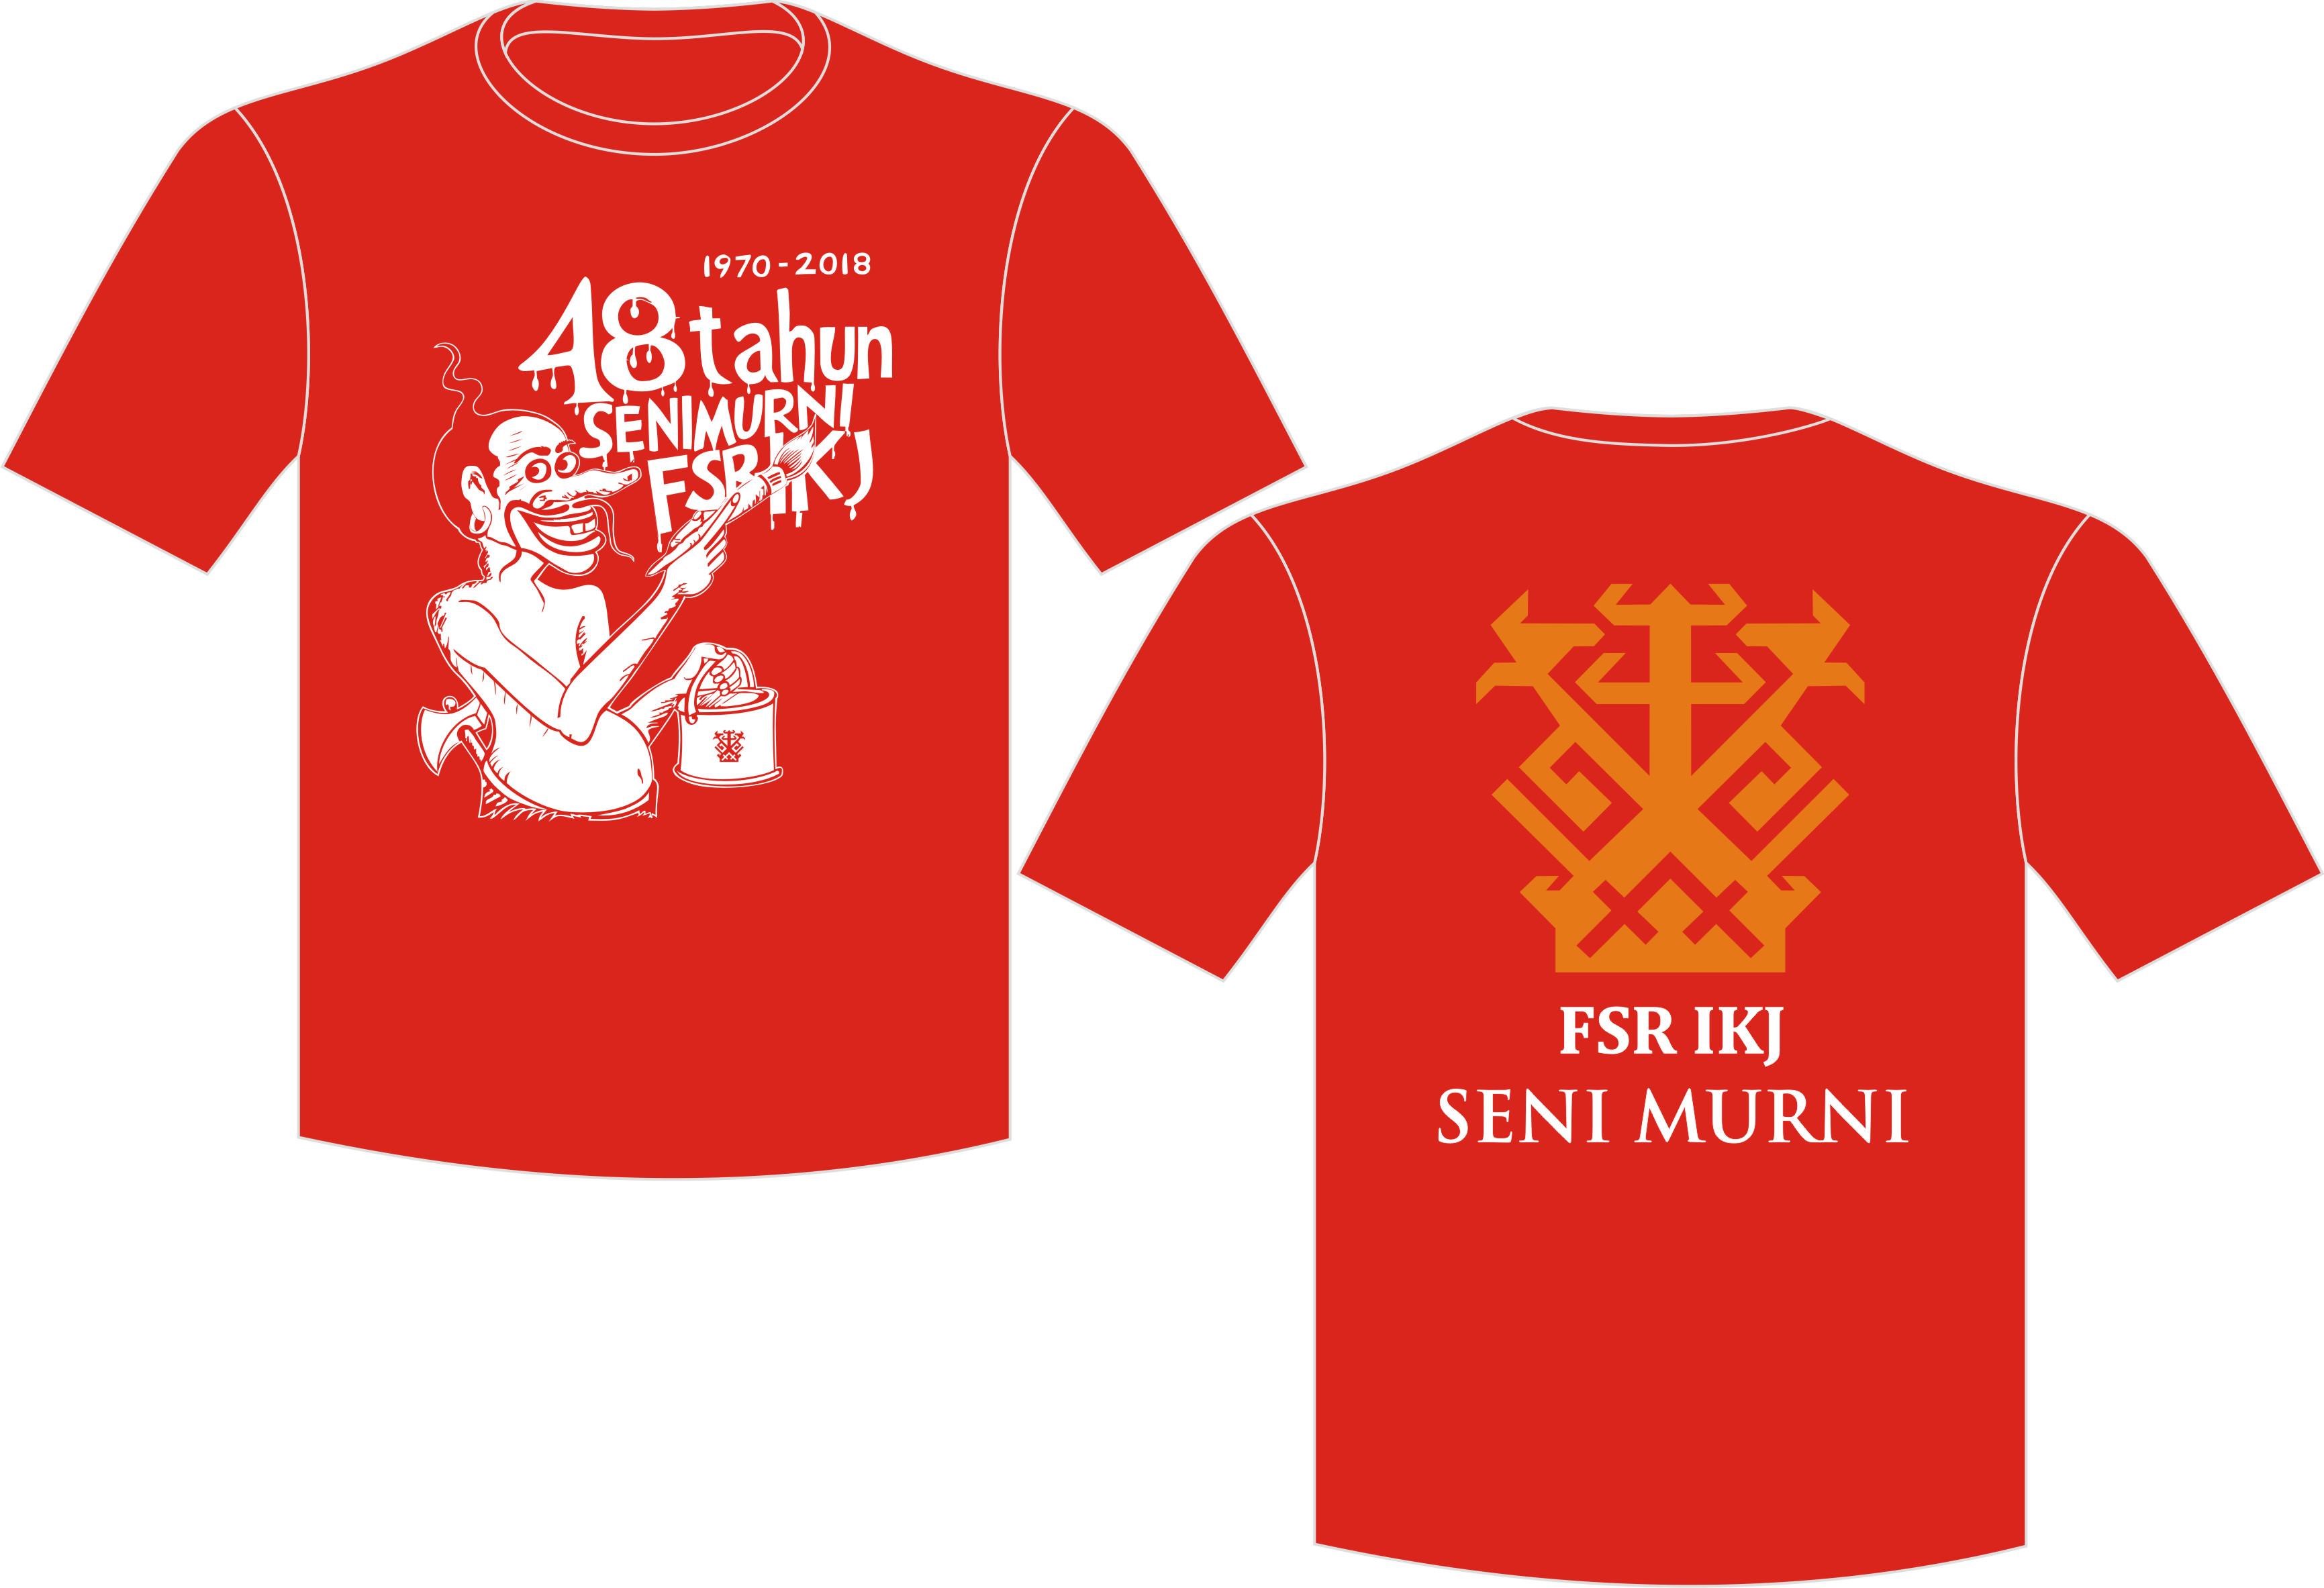 Kaos Oblong Merah